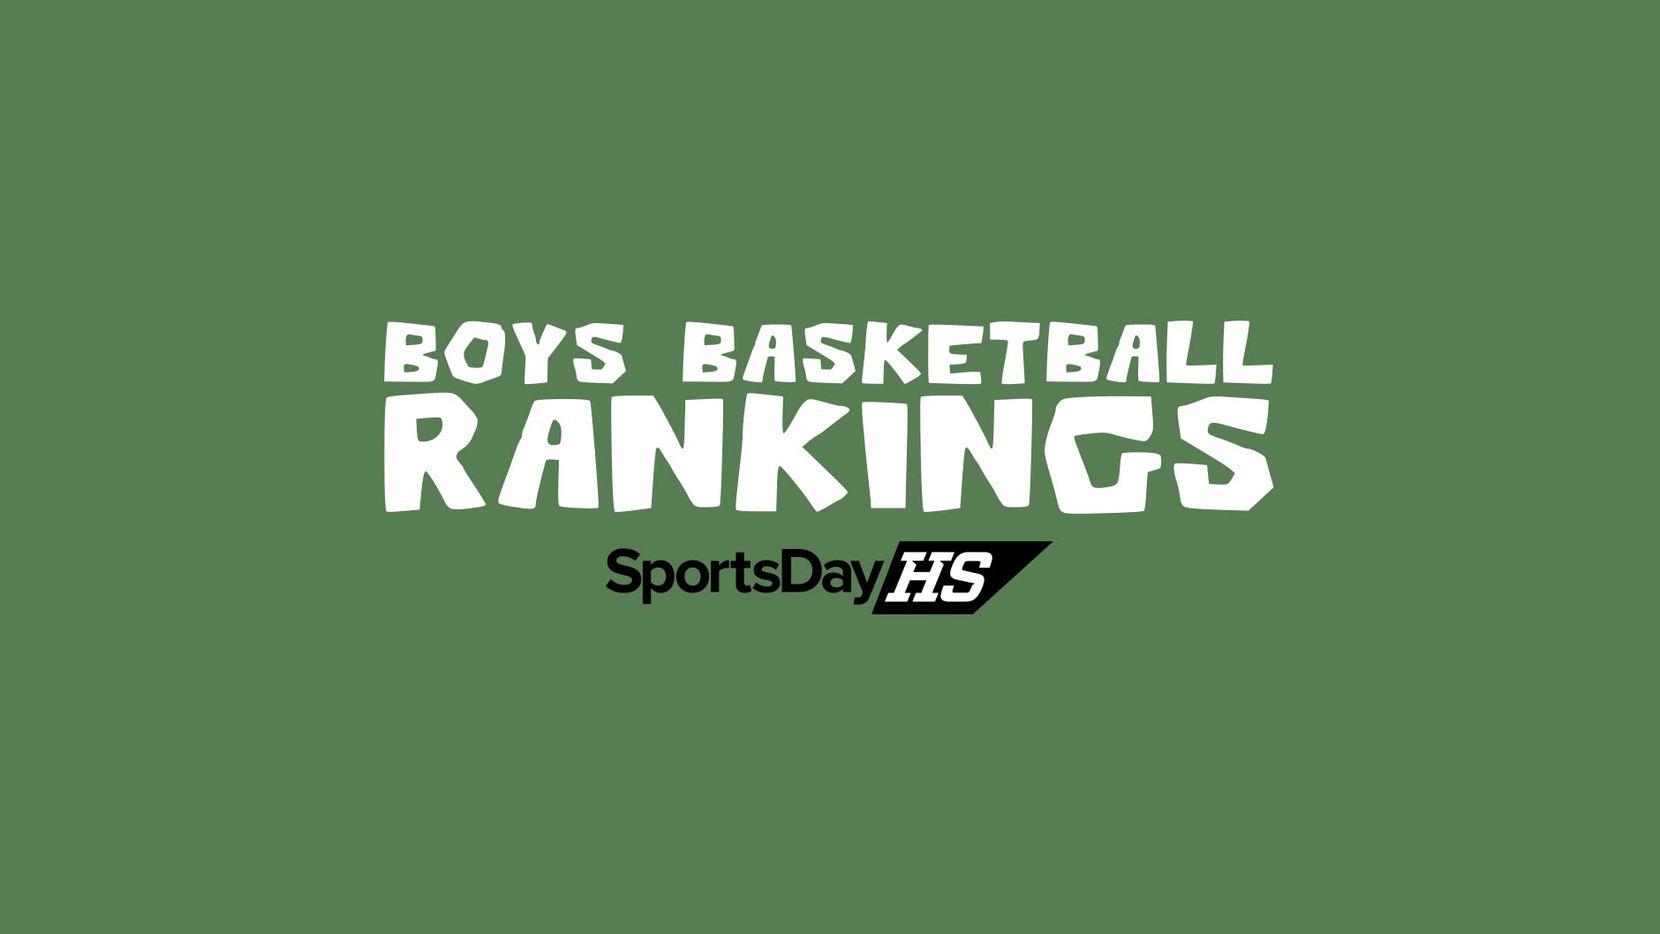 Boys basketball rankings.